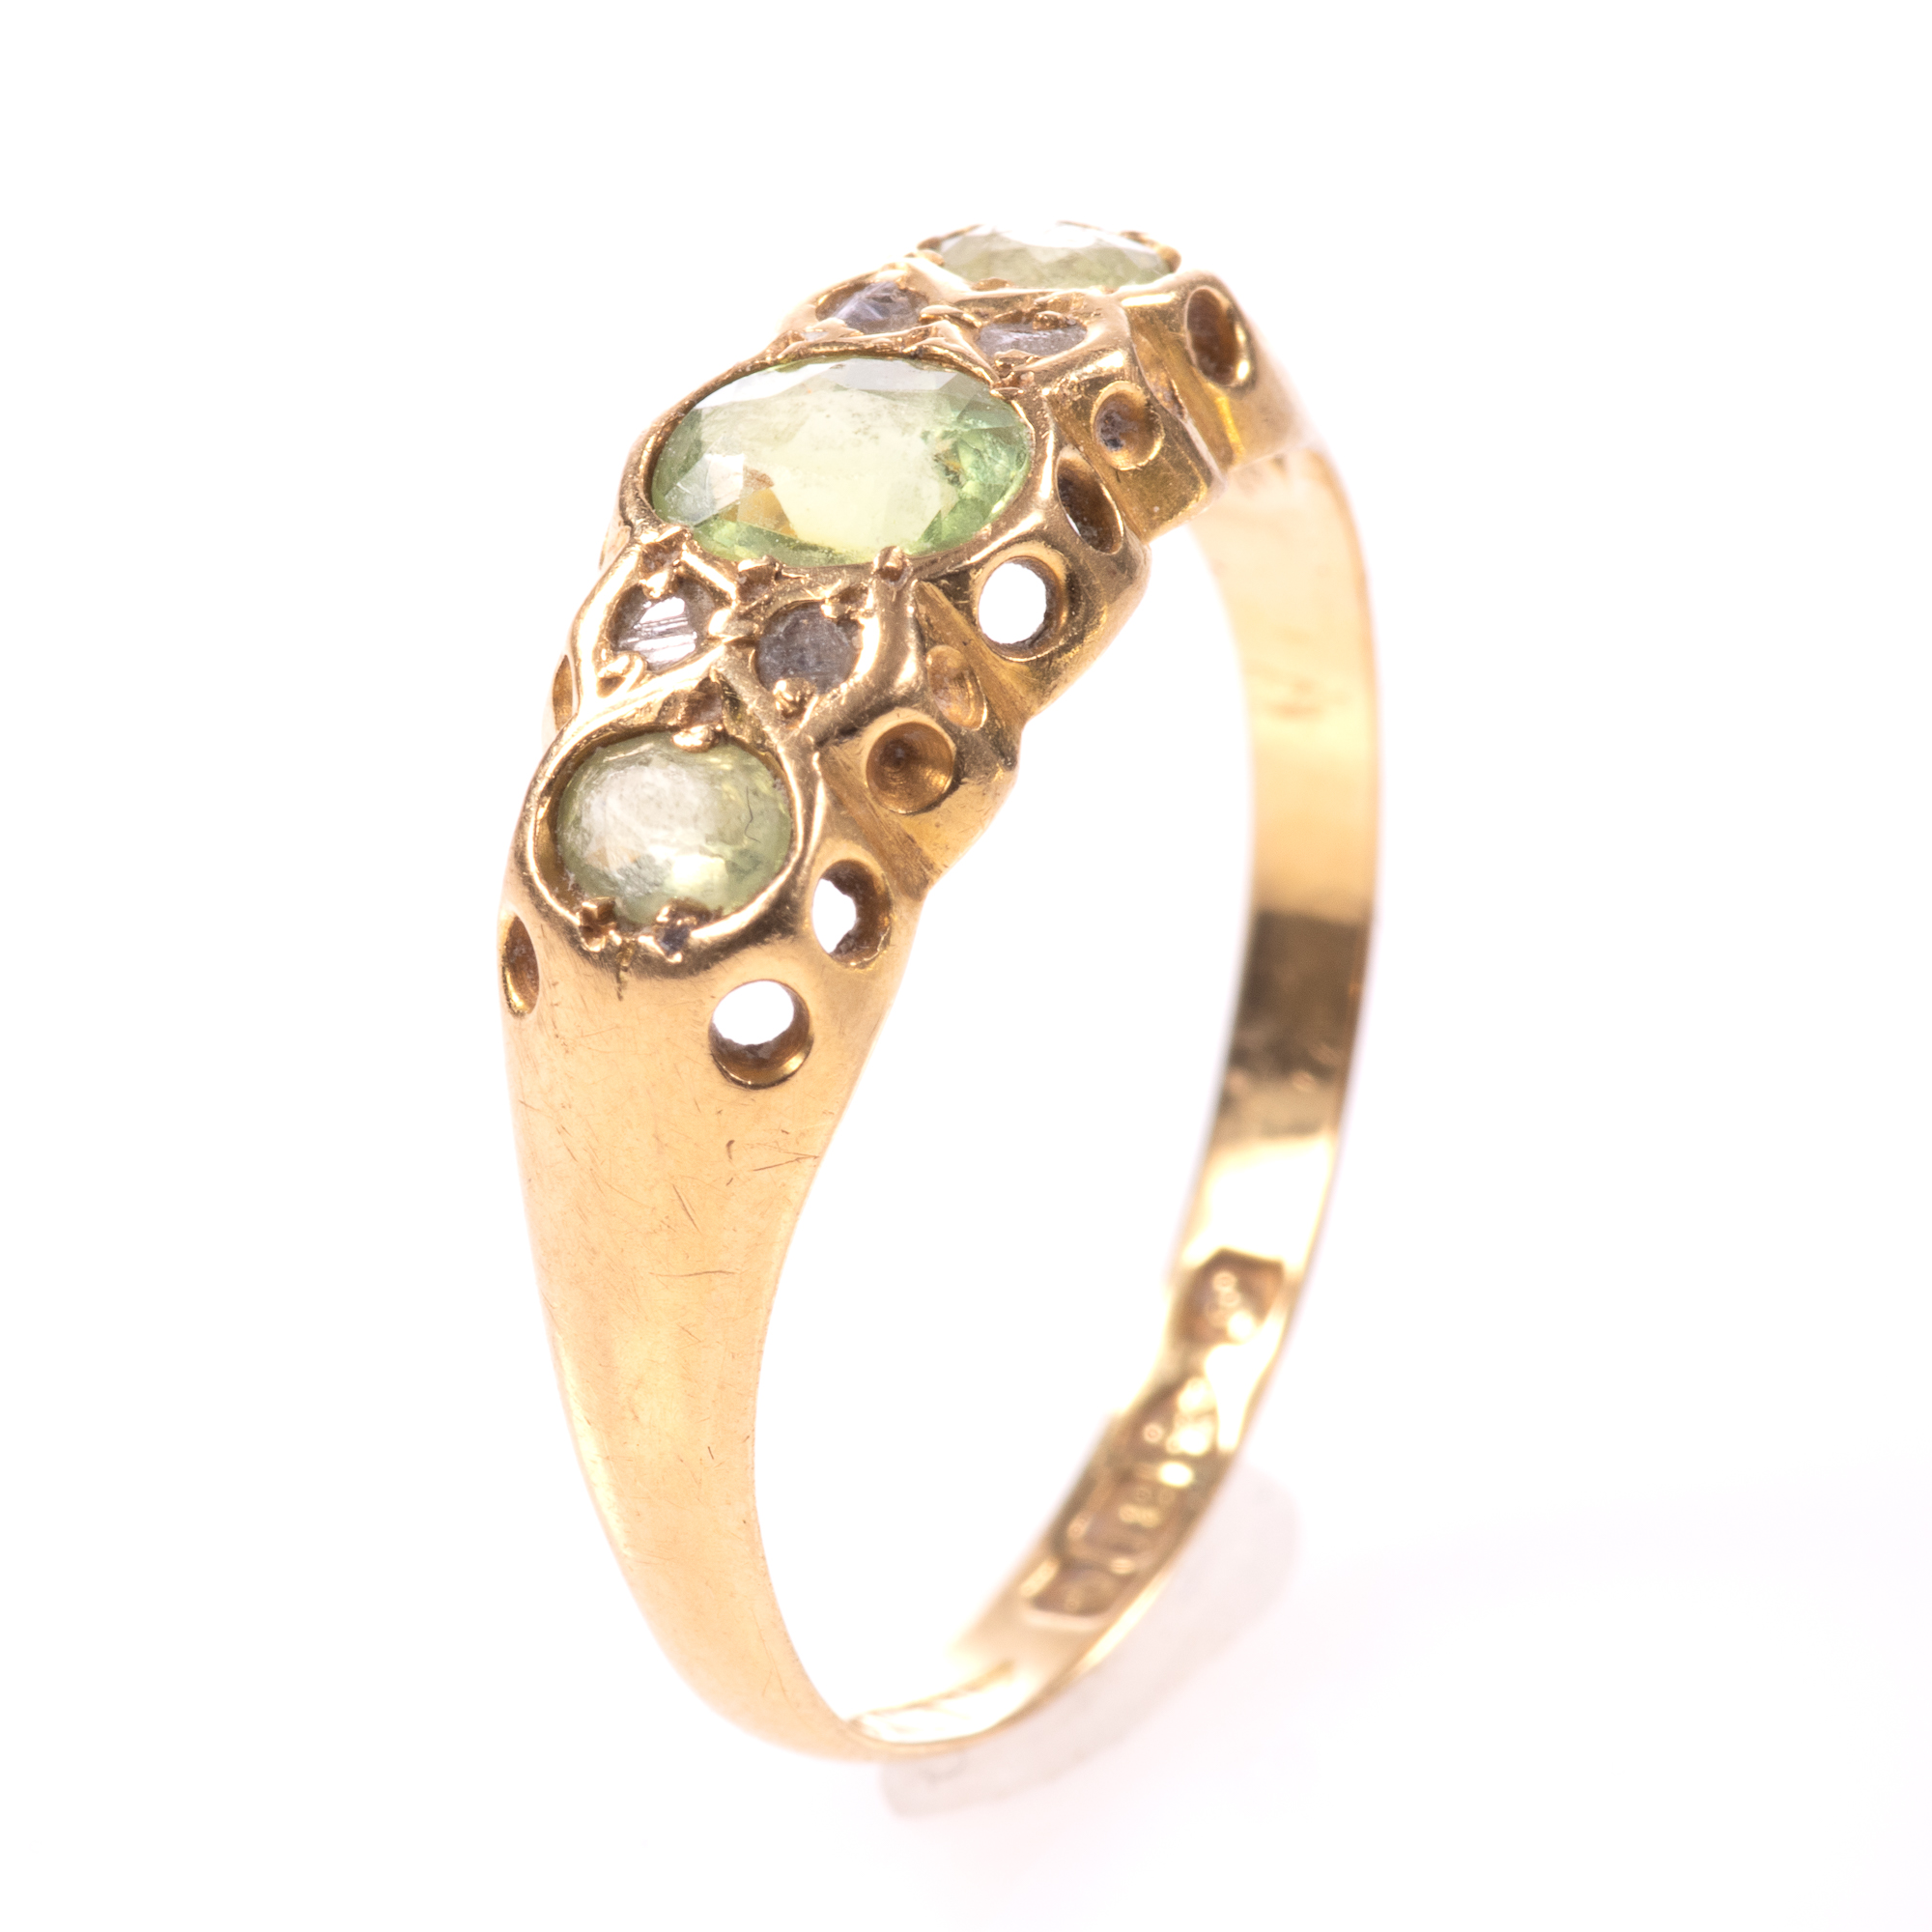 18ct Gold 0.90ct Peridot & Diamond Ring Chester 1918